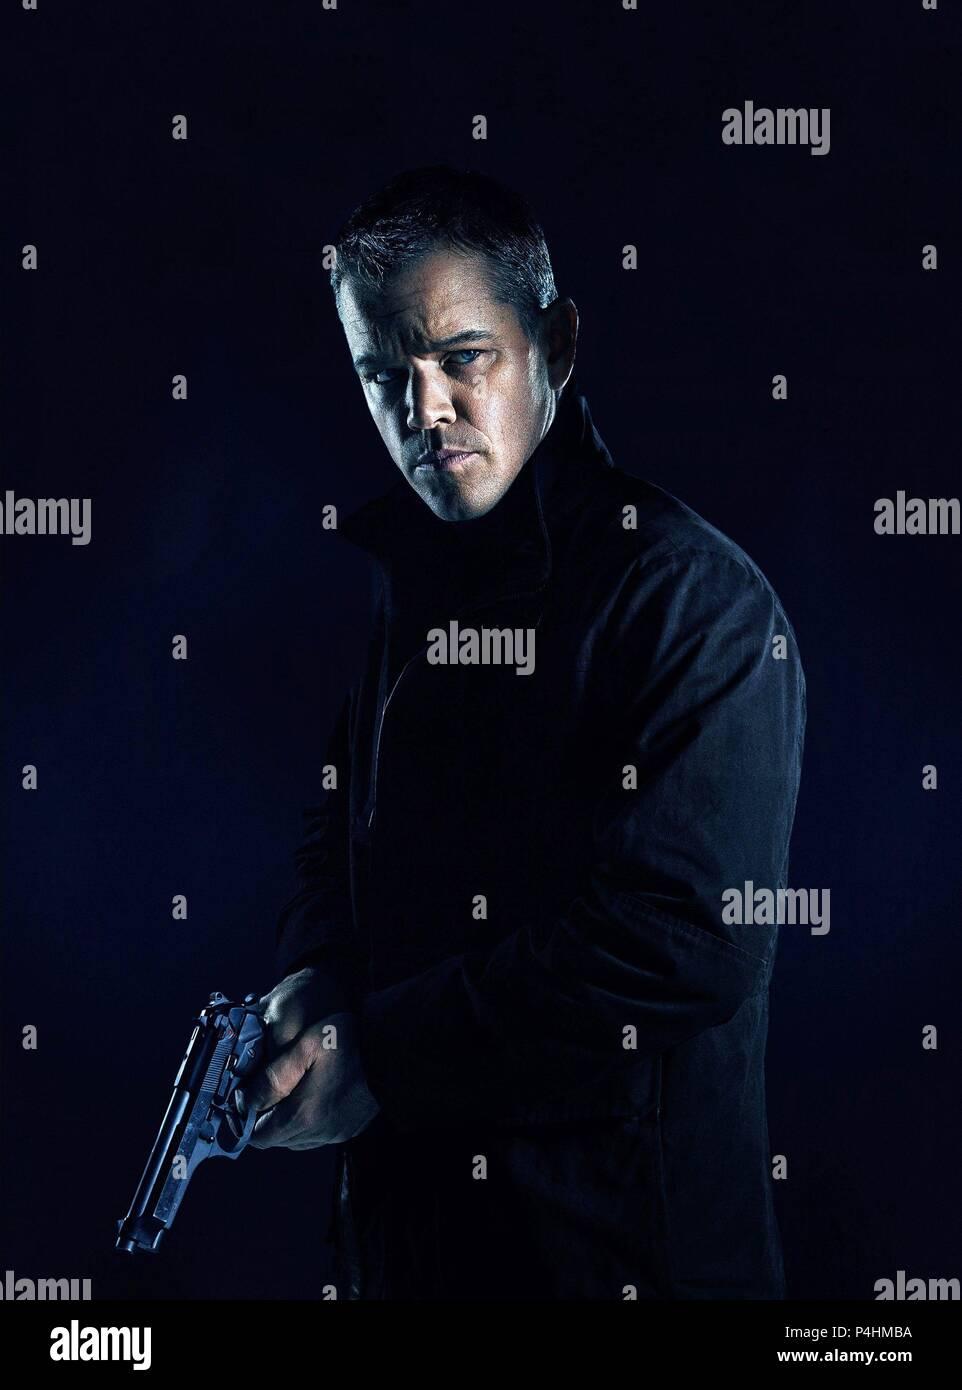 Original Film Title Jason Bourne English Title Jason Bourne Film Director Paul Greengrass Year 2016 Stars Matt Damon Credit Universal Pictures Thekennedy Marshall Company Captivate Ent Album Stock Photo Alamy